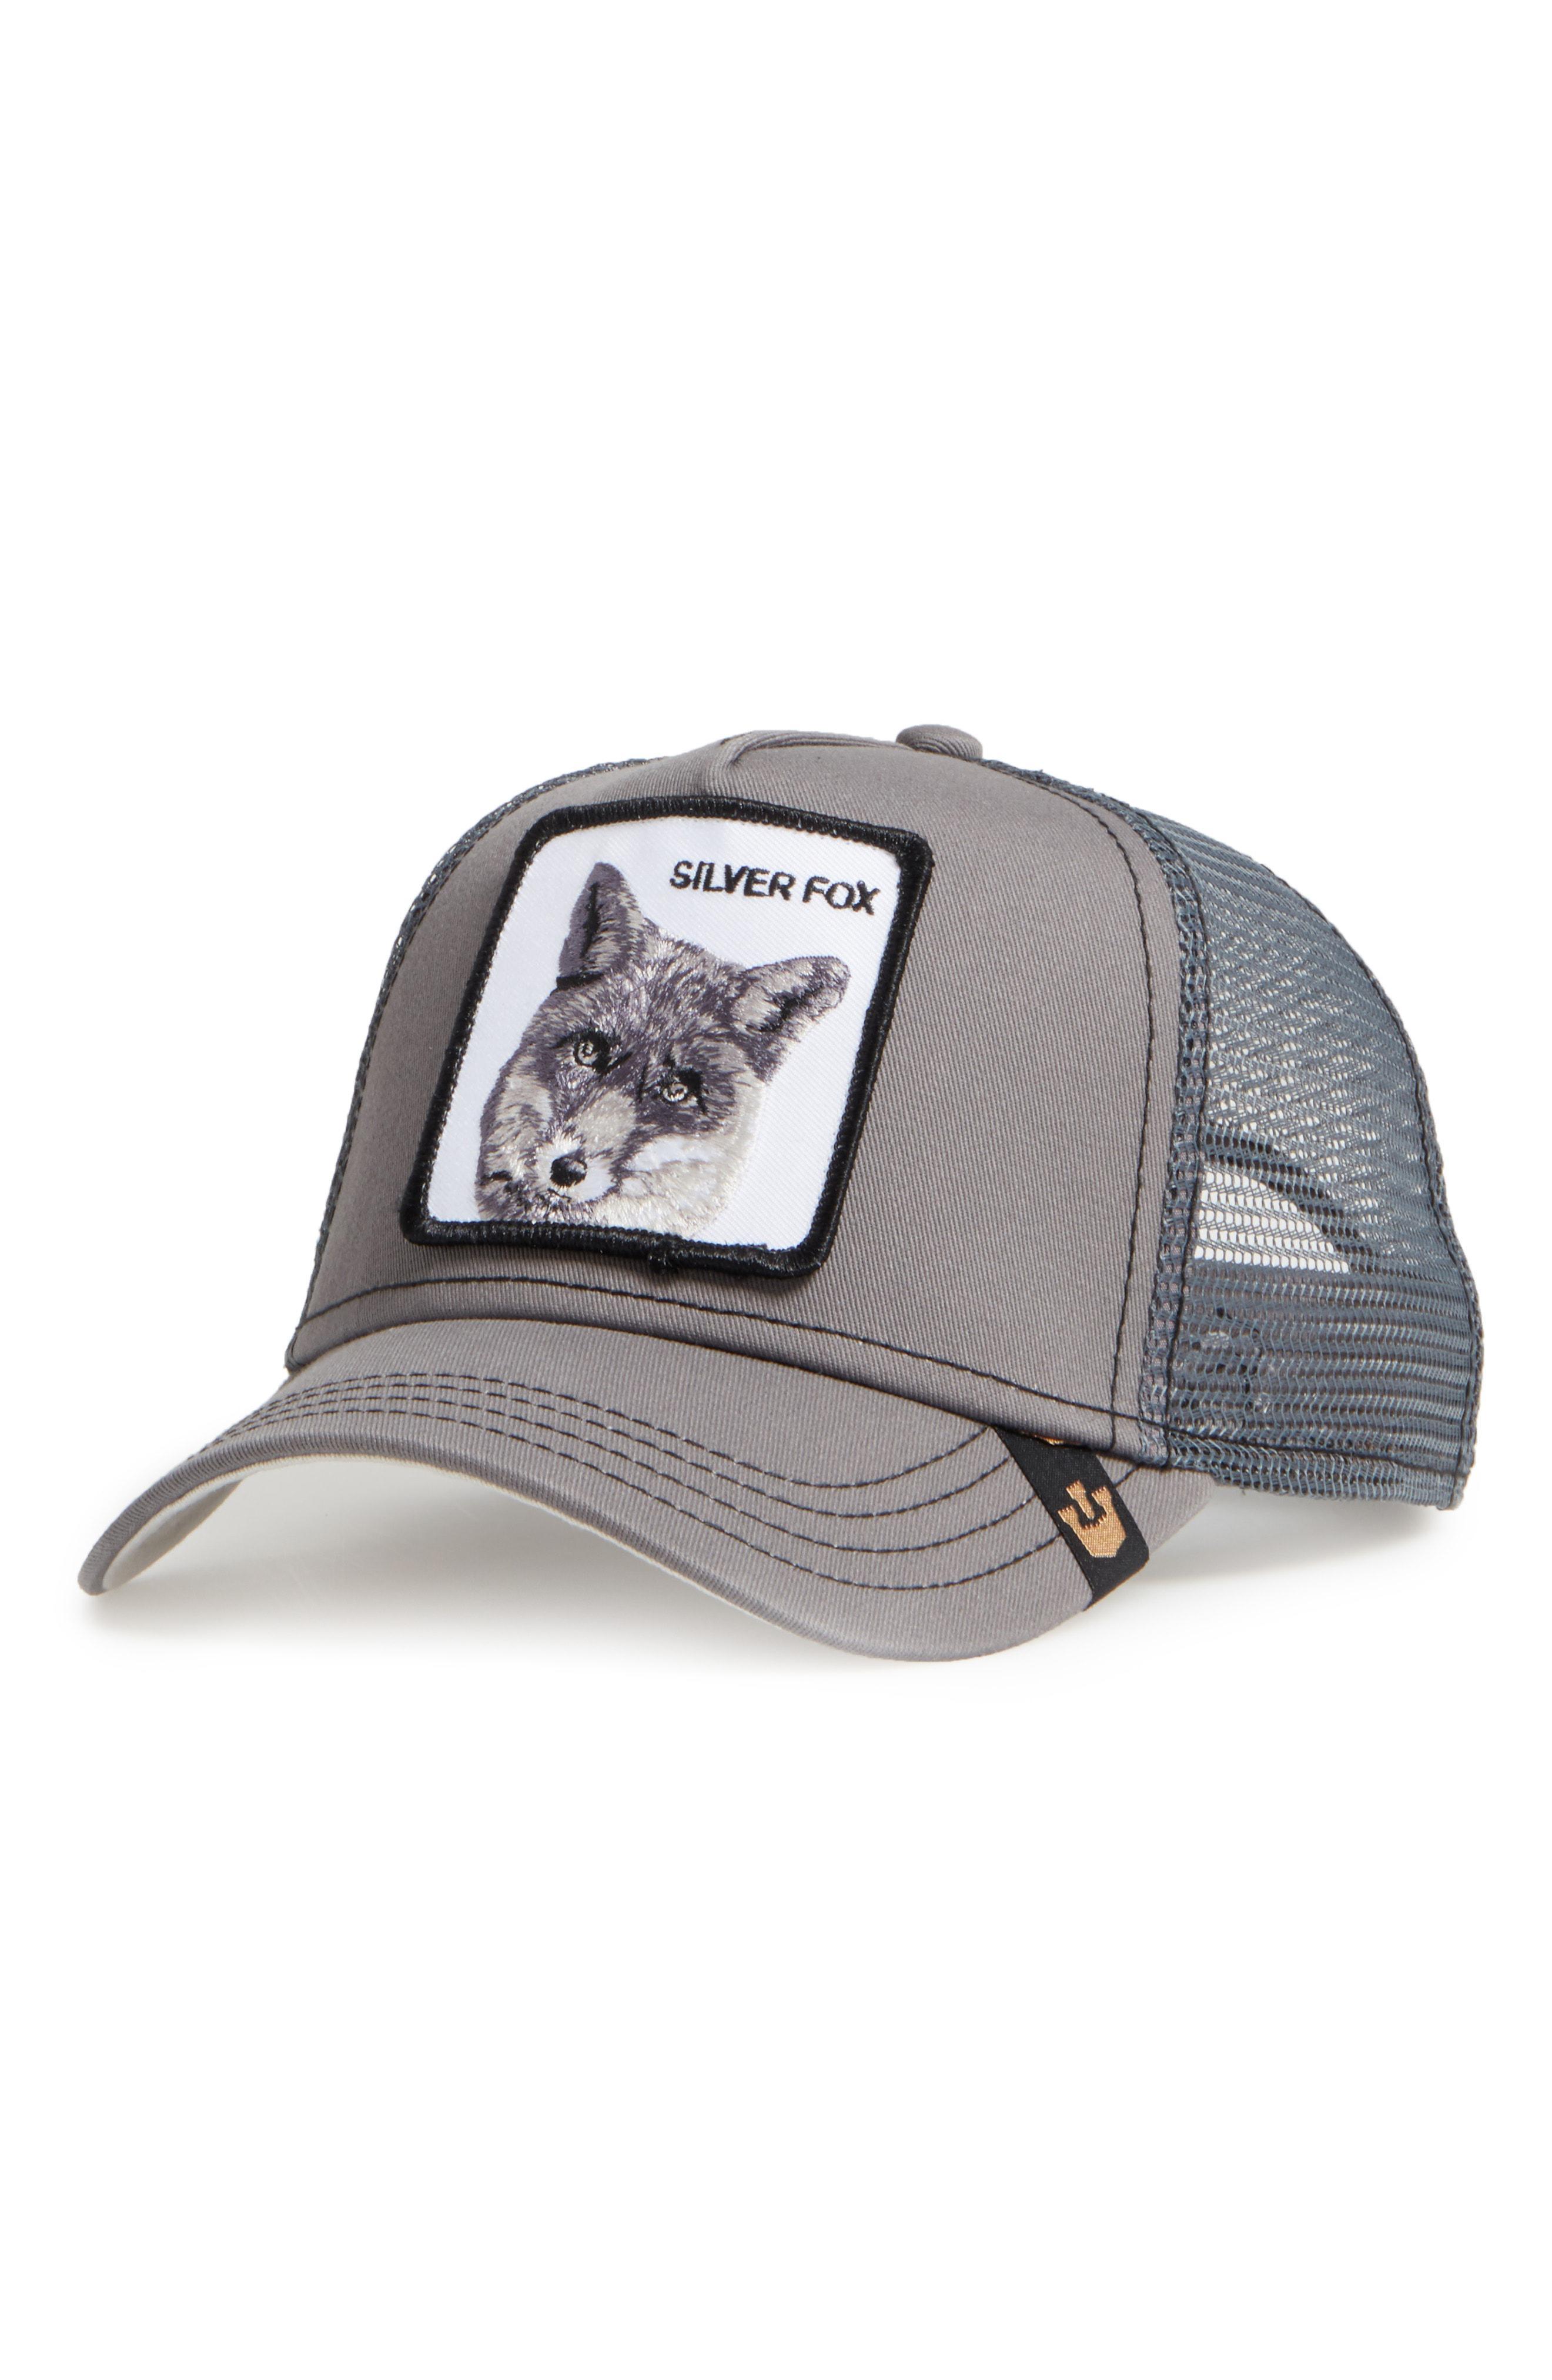 a337ce95b68 Lyst - Goorin Bros  silver Fox  Trucker Hat in Gray for Men